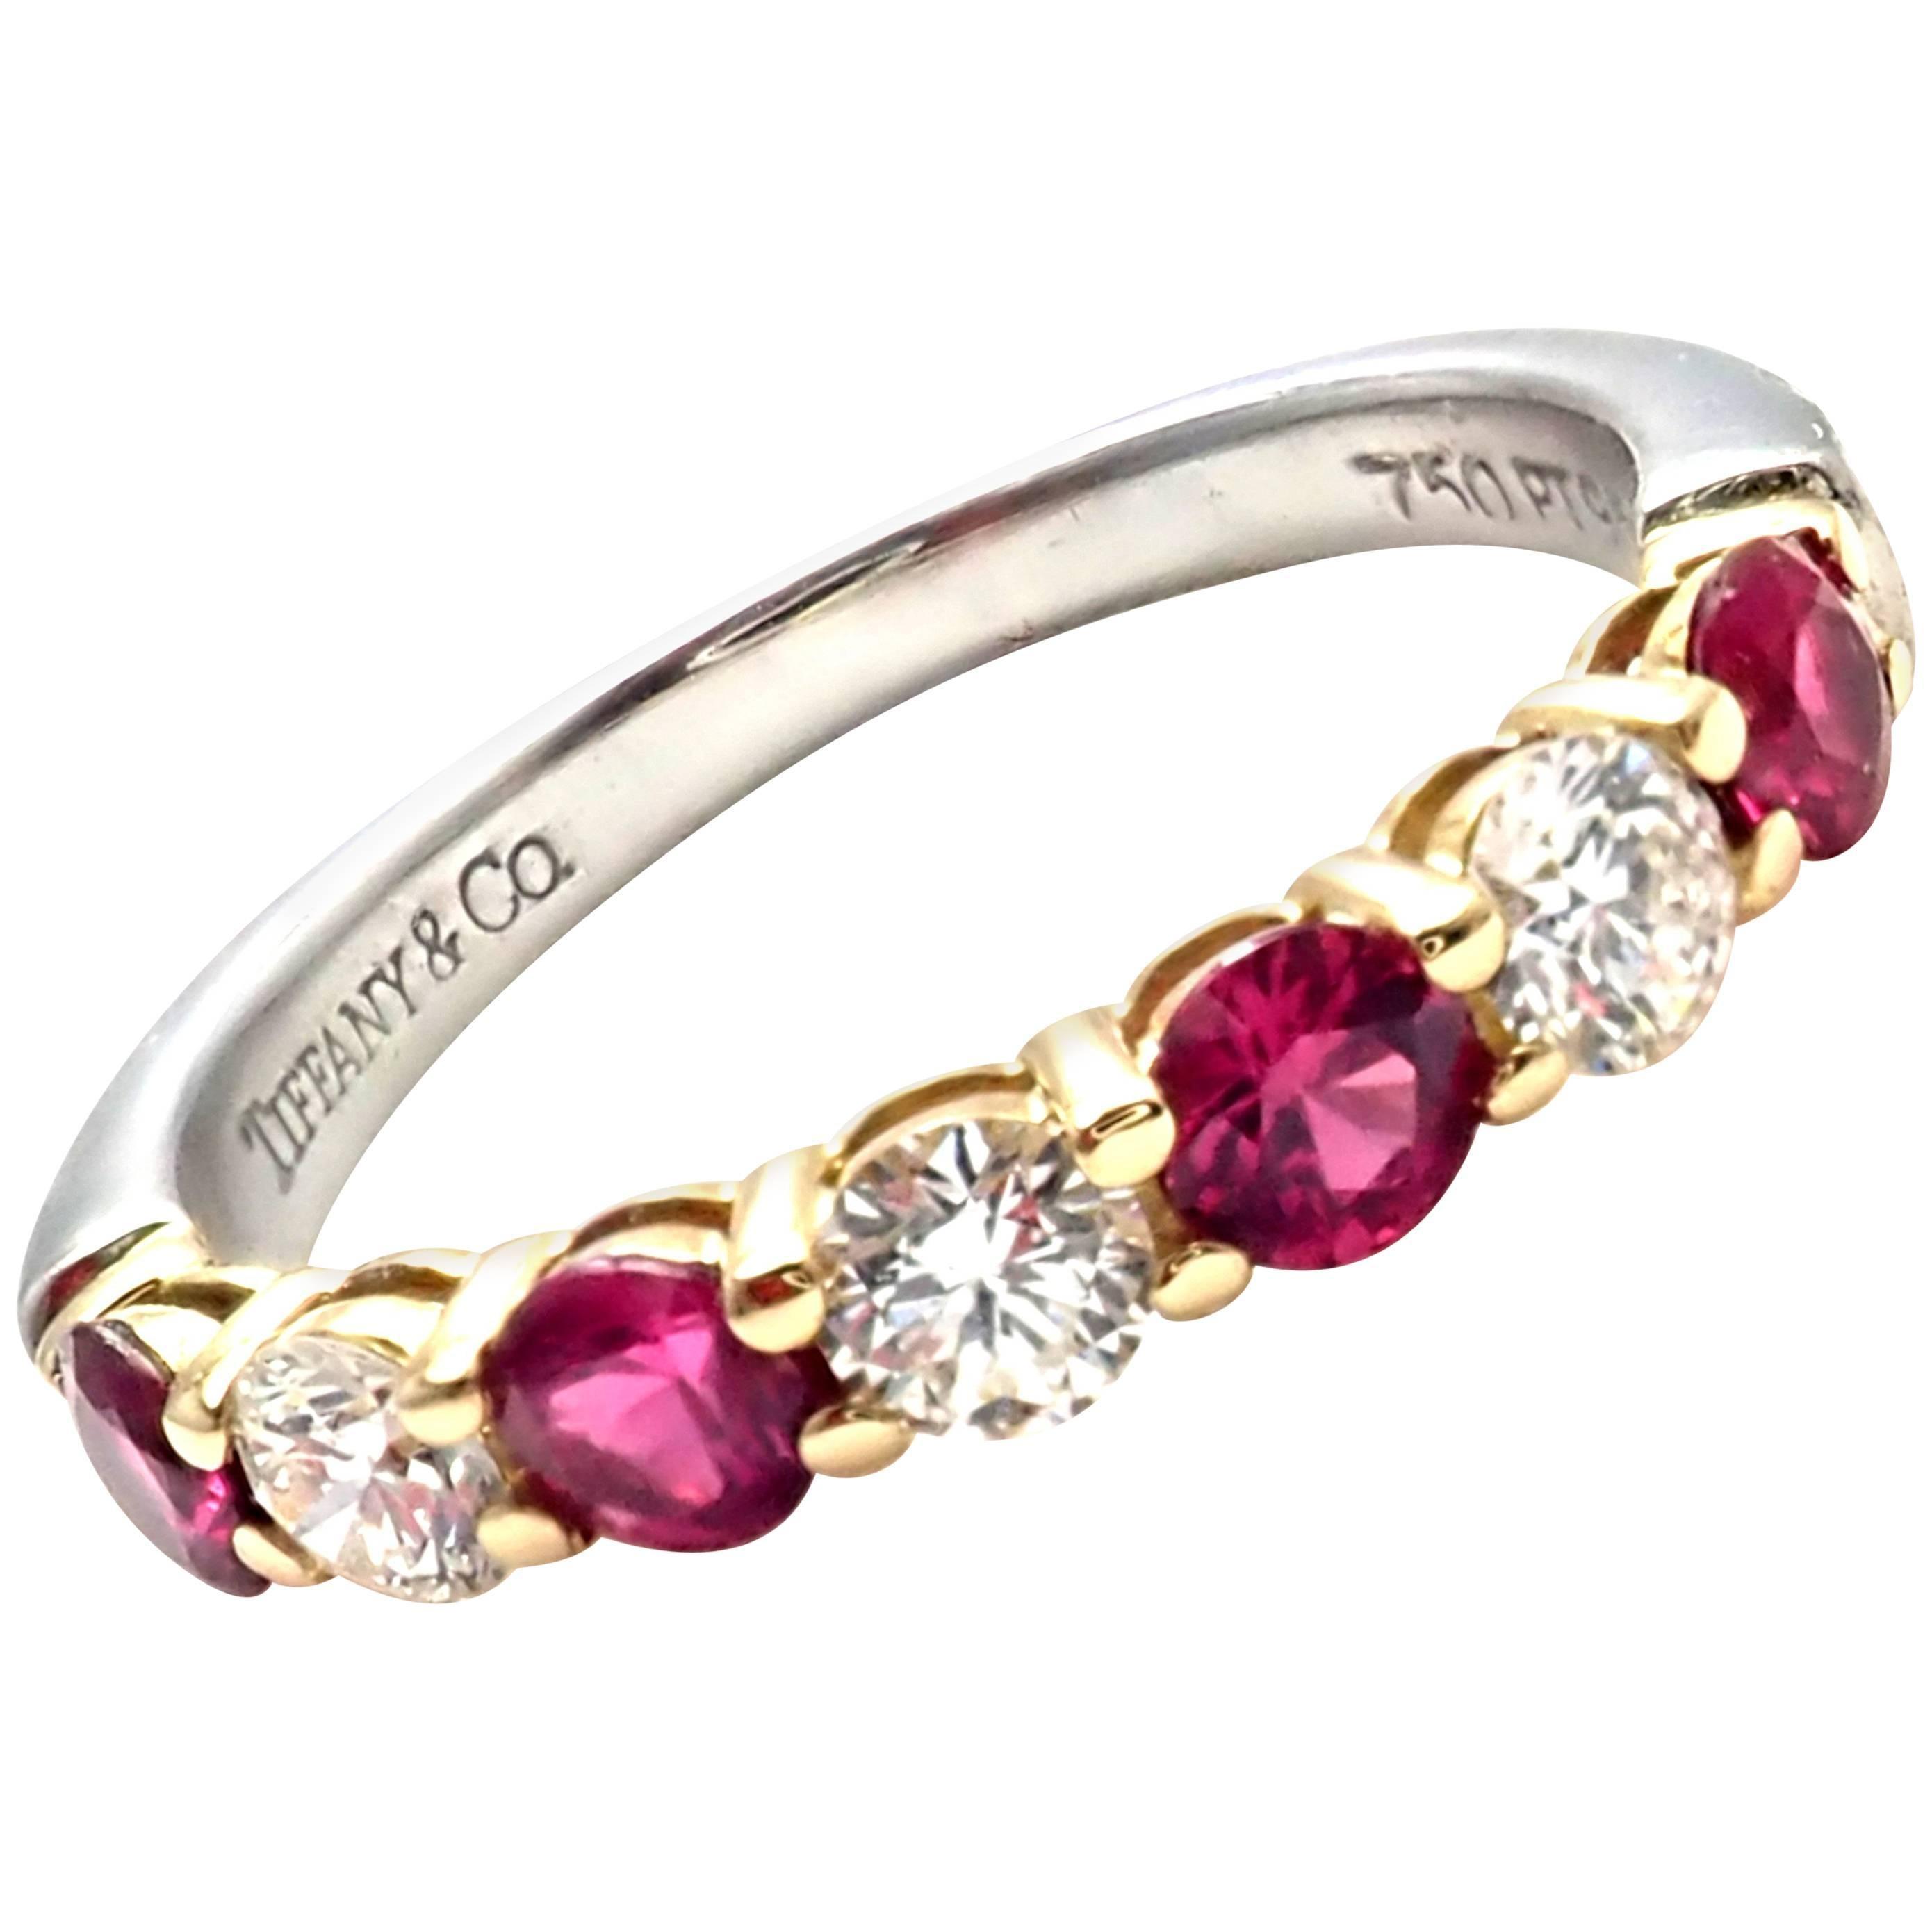 b7da6f216 Tiffany And Co Diamond Ruby Platinum Yellow Gold Band Ring At 1stdibs